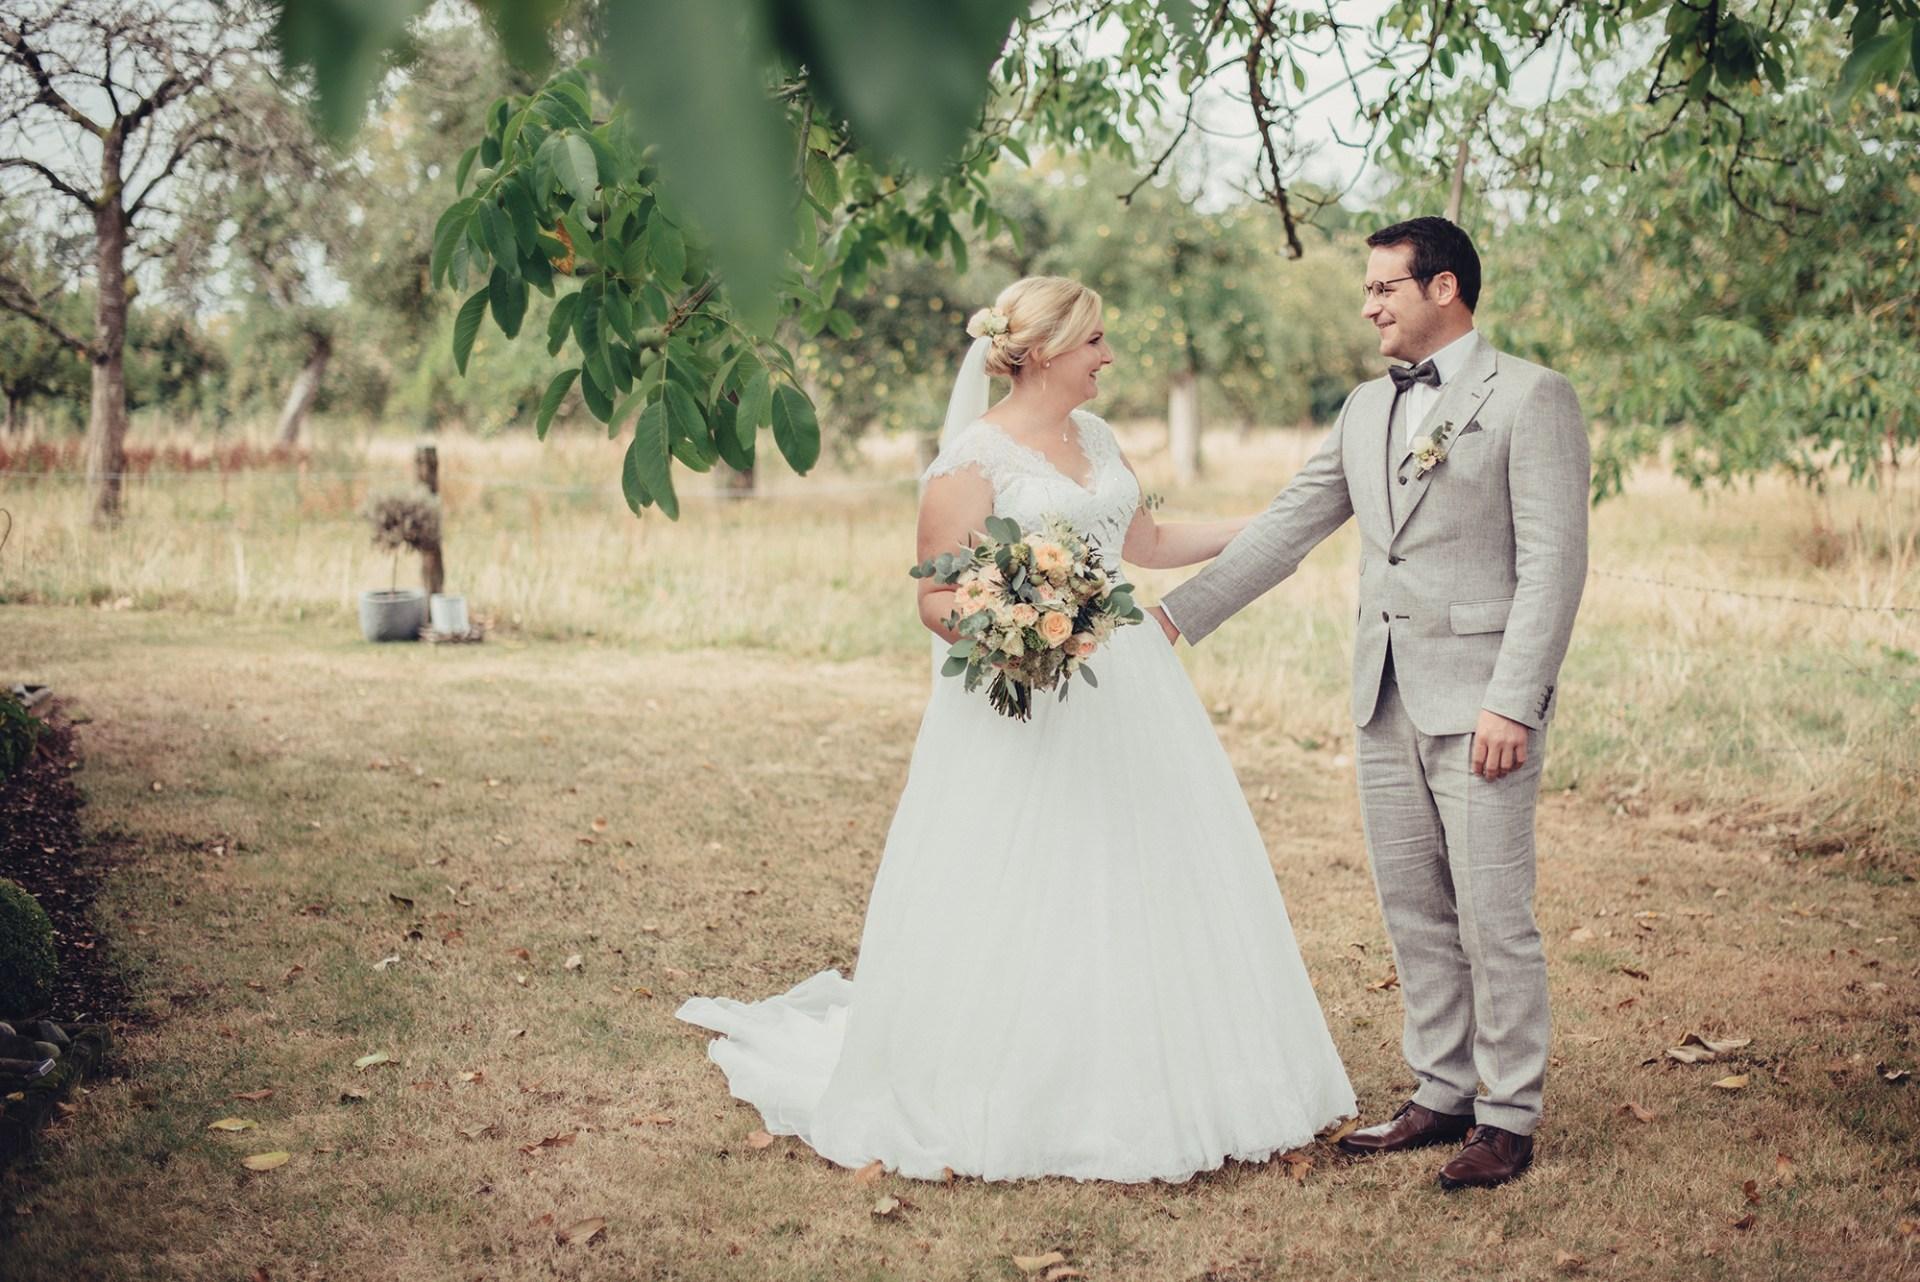 weddingseptemberluminoxx92348234058